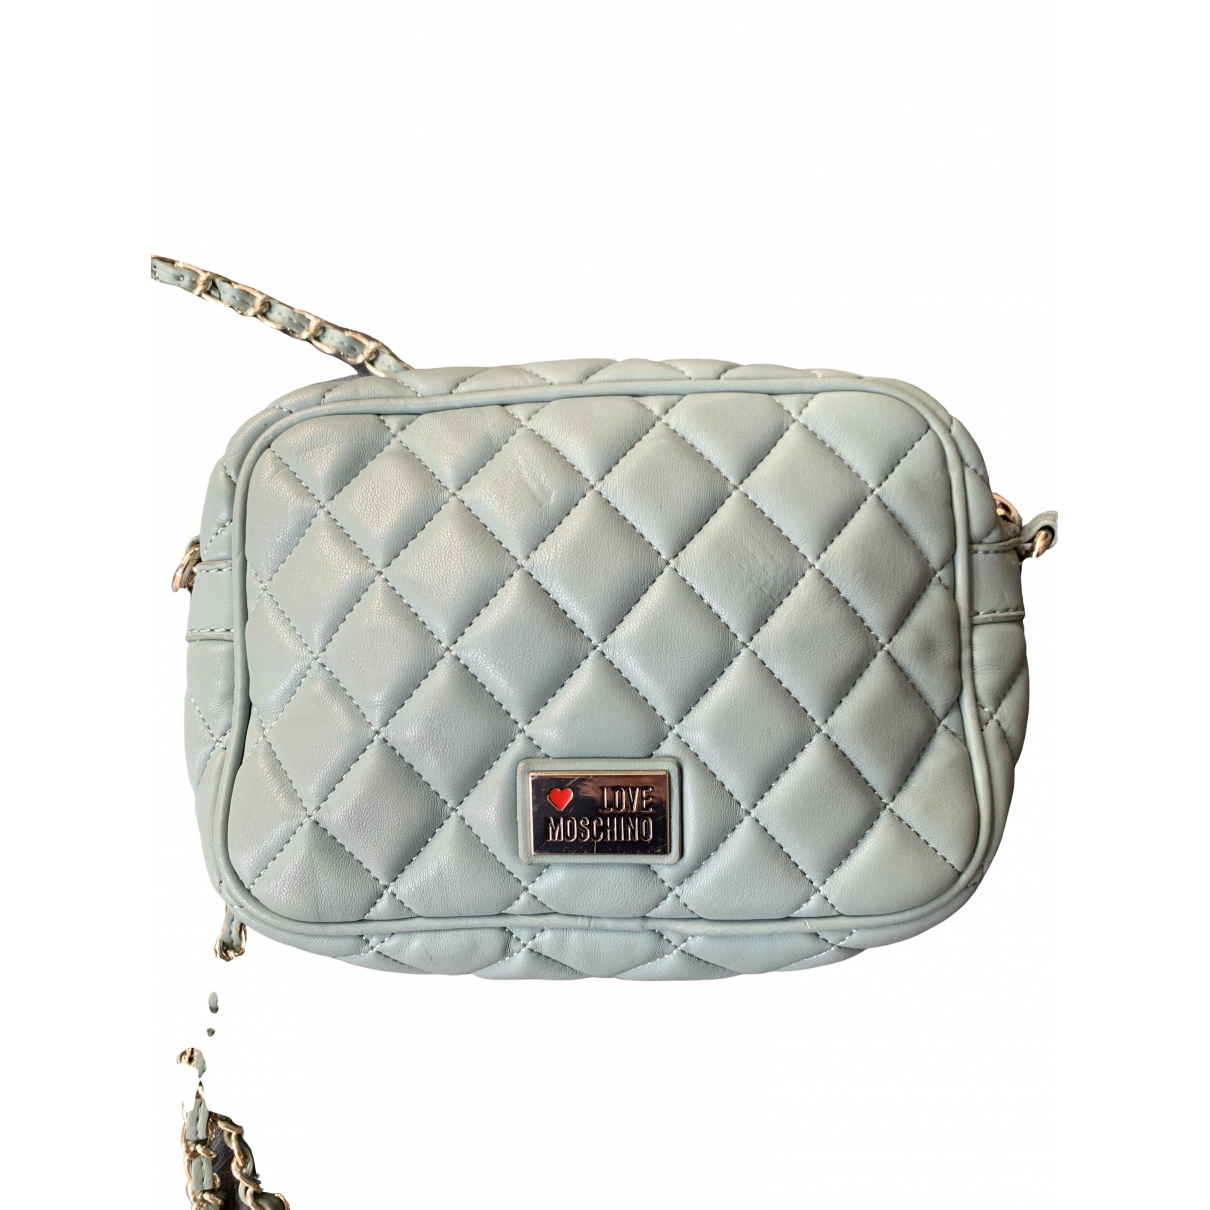 Moschino Love \N Green Patent leather handbag for Women \N